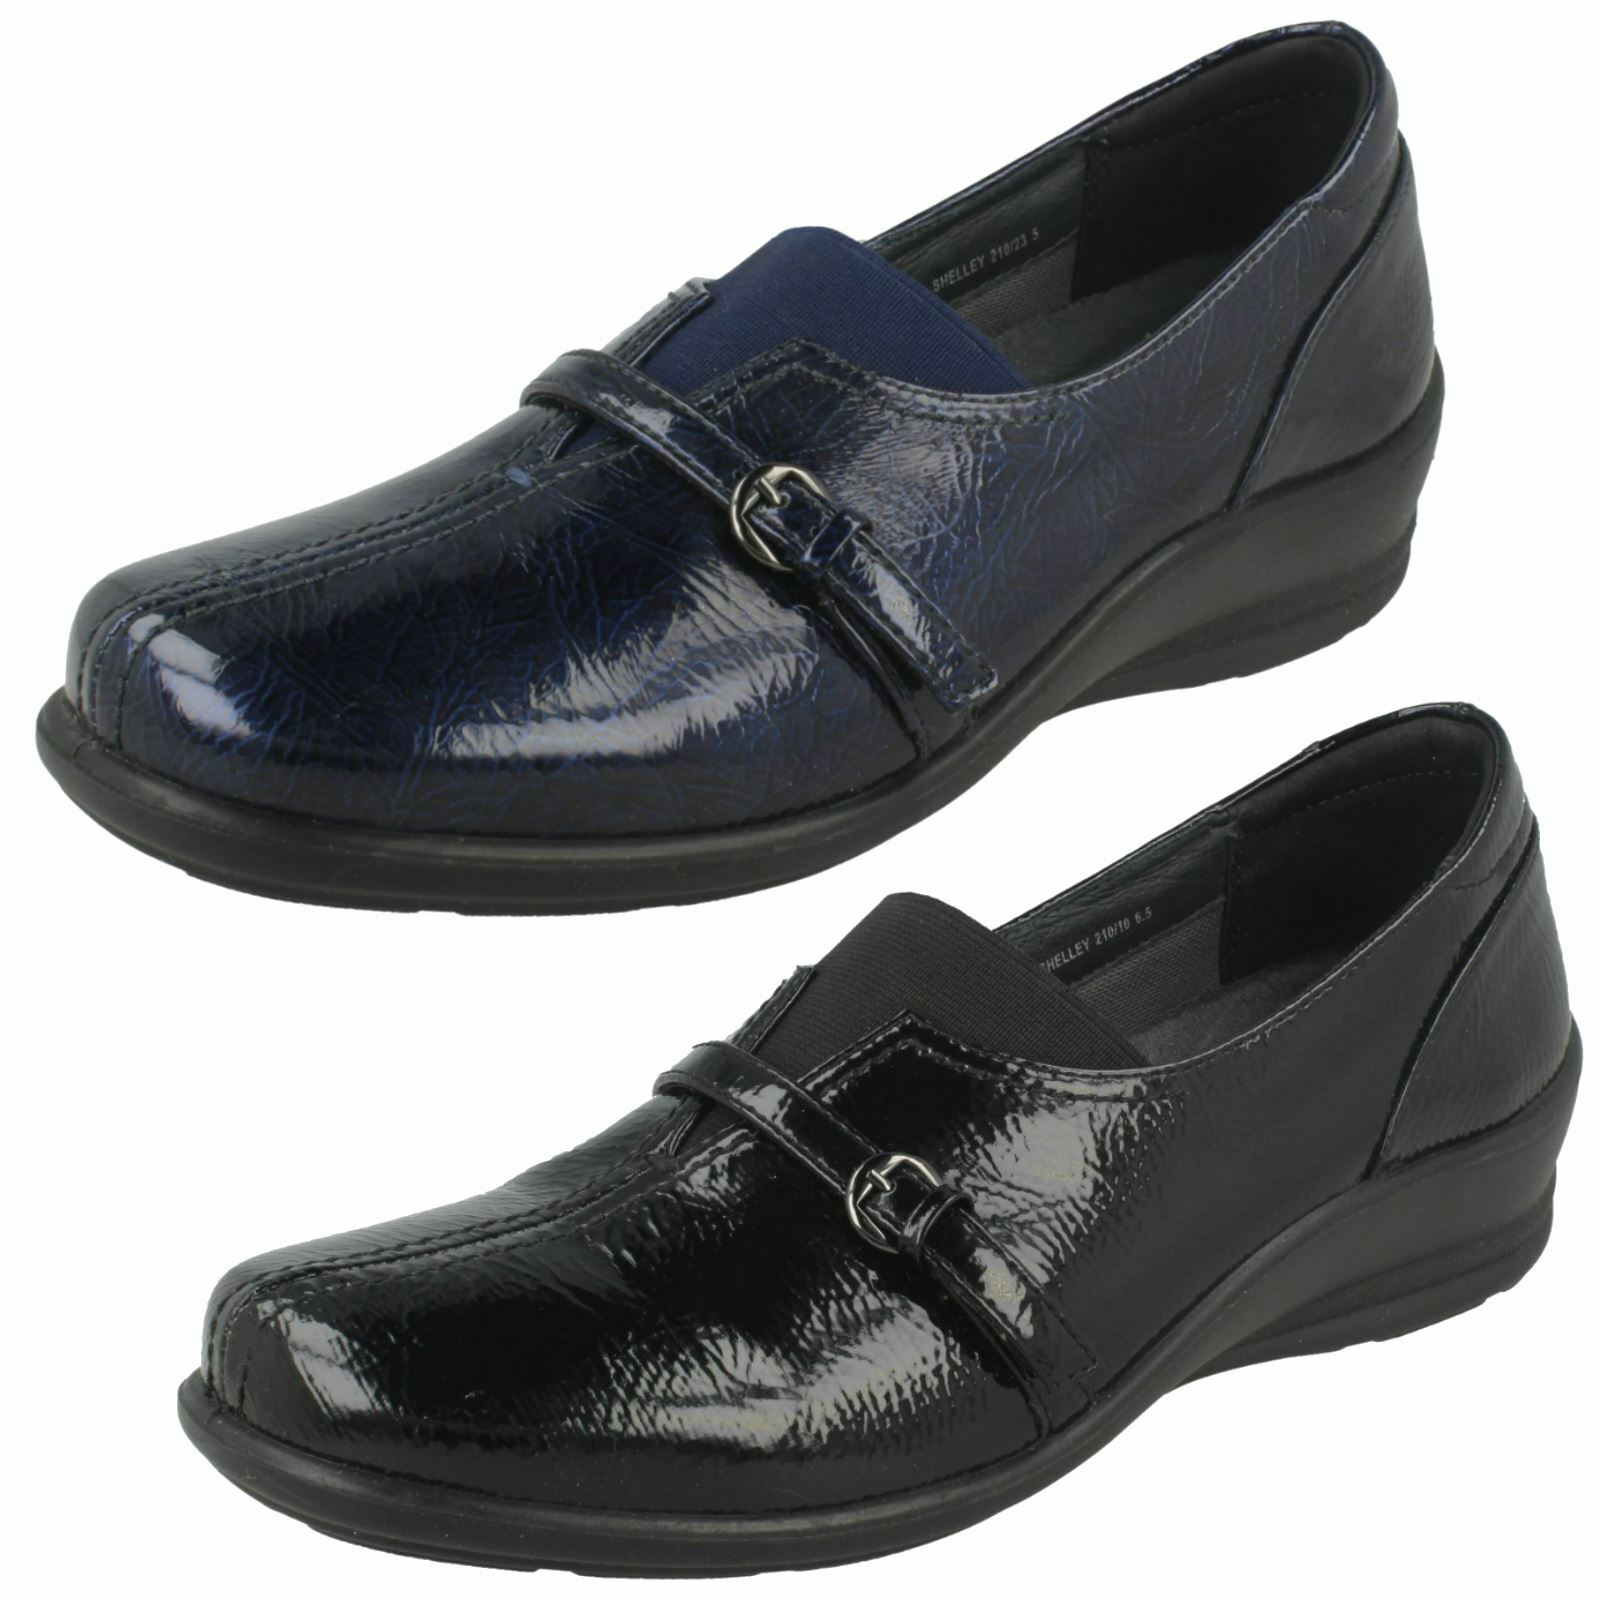 online al miglior prezzo Ladies Padders Dual Dual Dual Fit System confort Flats-Shelley  nessun minimo